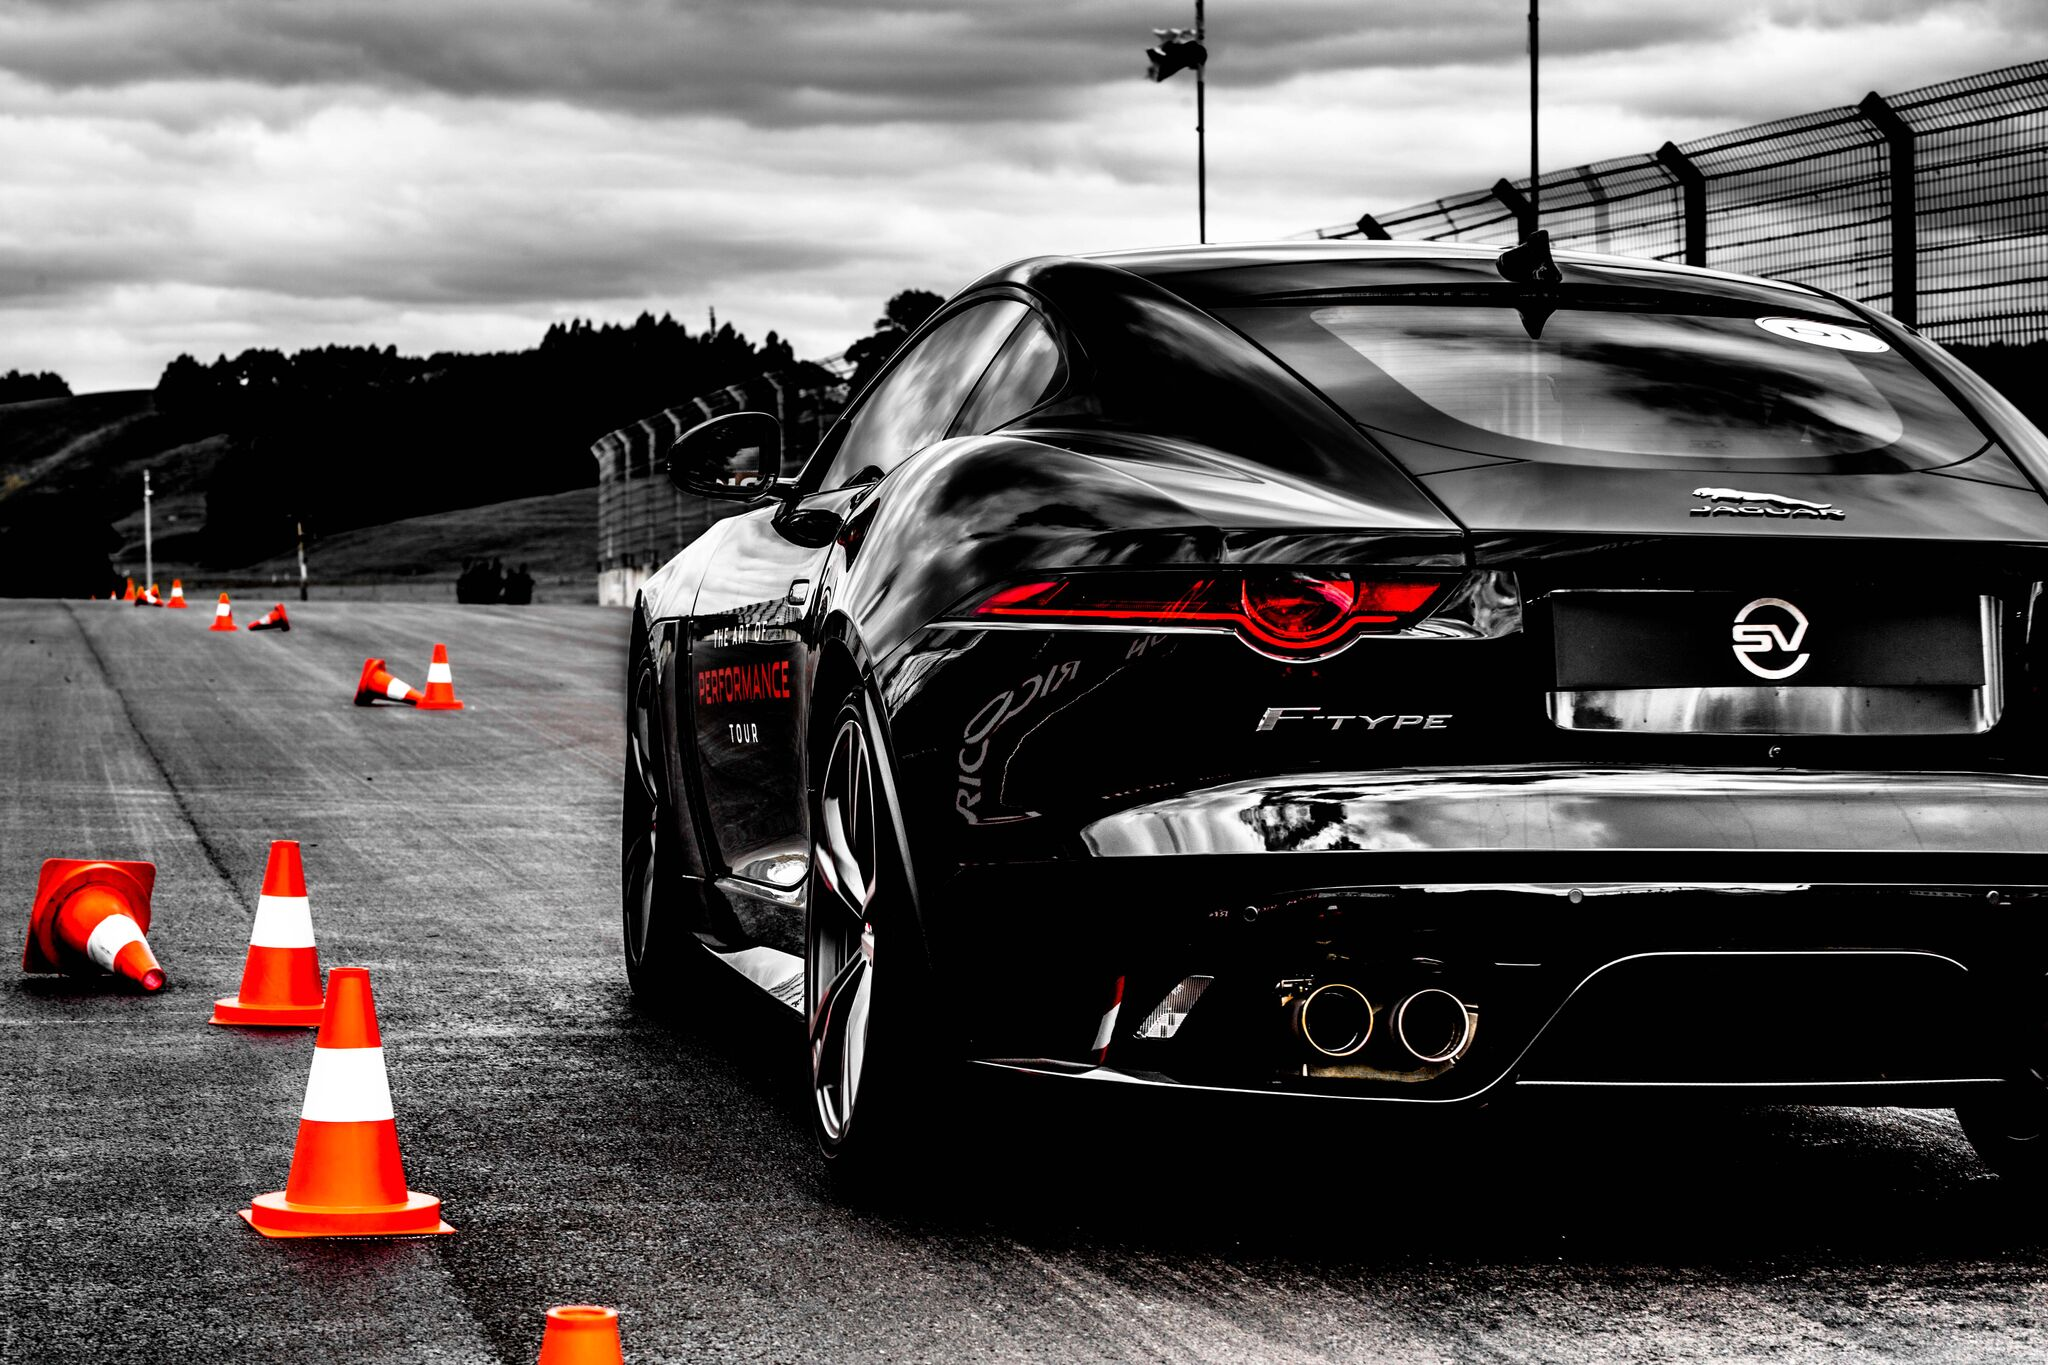 Jaguar - Art of Performance - WED AFTERNOON 2MB-119_preview.jpeg